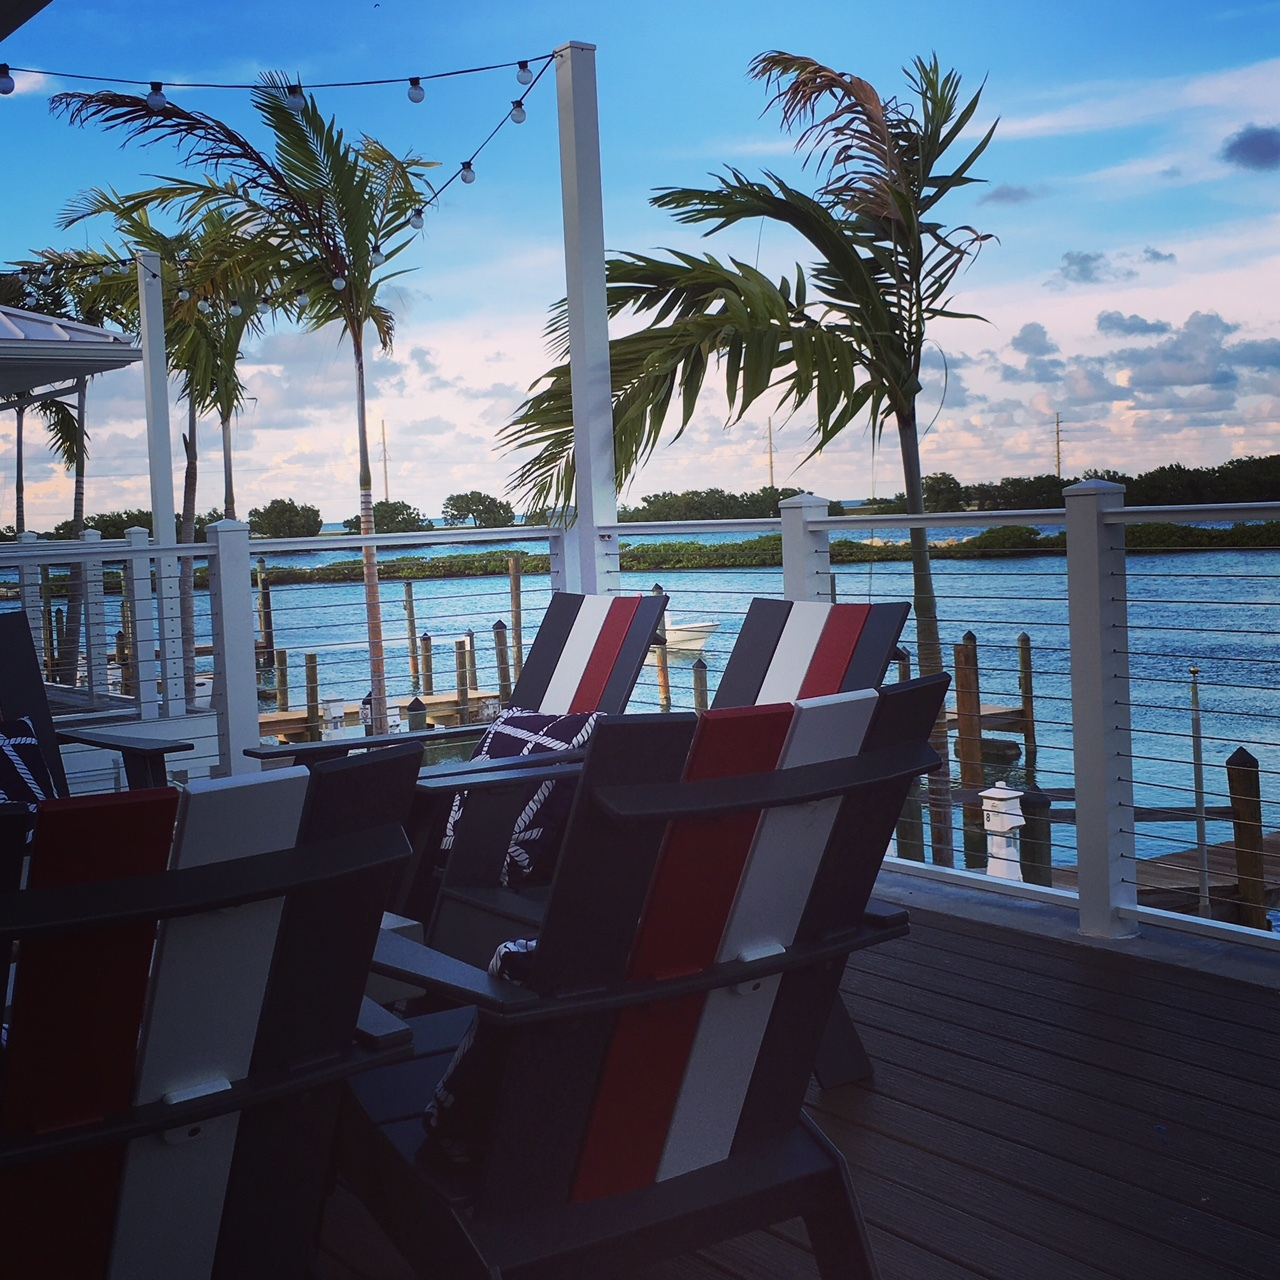 Hawks Cay Resort - Anchor and Ale Restaurant - Hawks Cay Resort view - florida keys - - empty nester getaway - romantic getaway idea - getaway idea for couples - empty nest travel - empty nest - empty nester